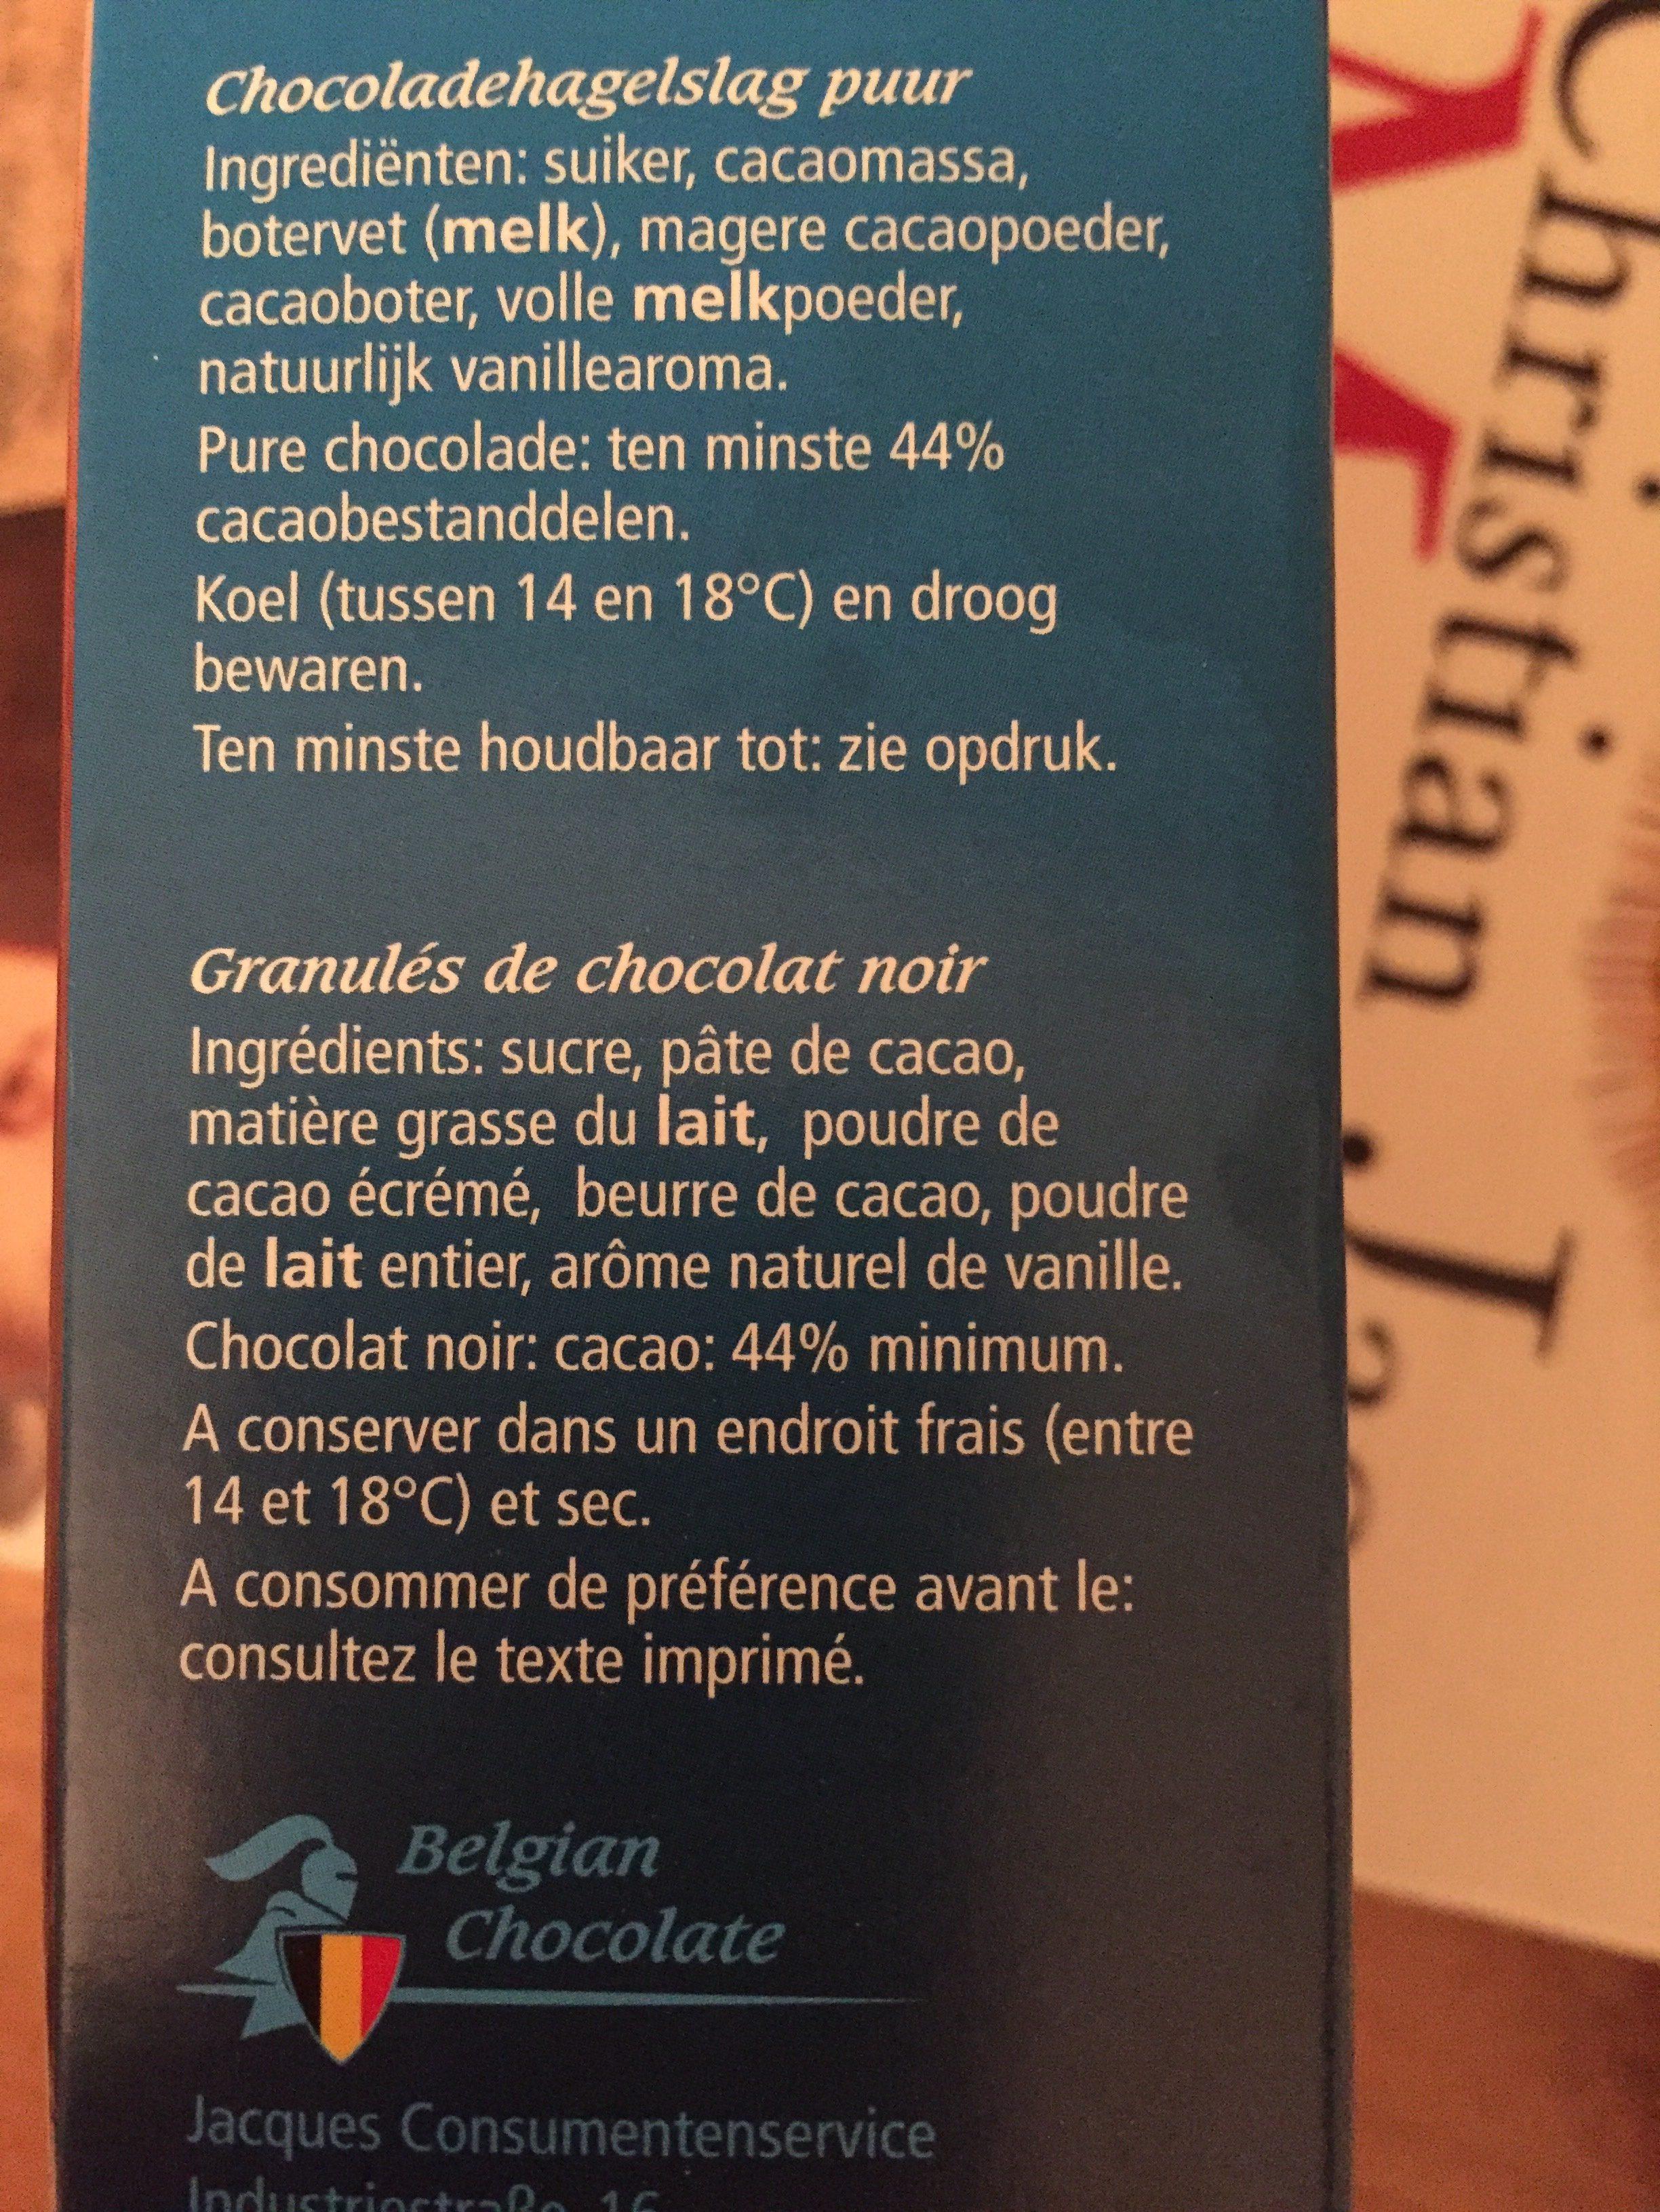 Granulés de Chocolat Fondant - Ingredients